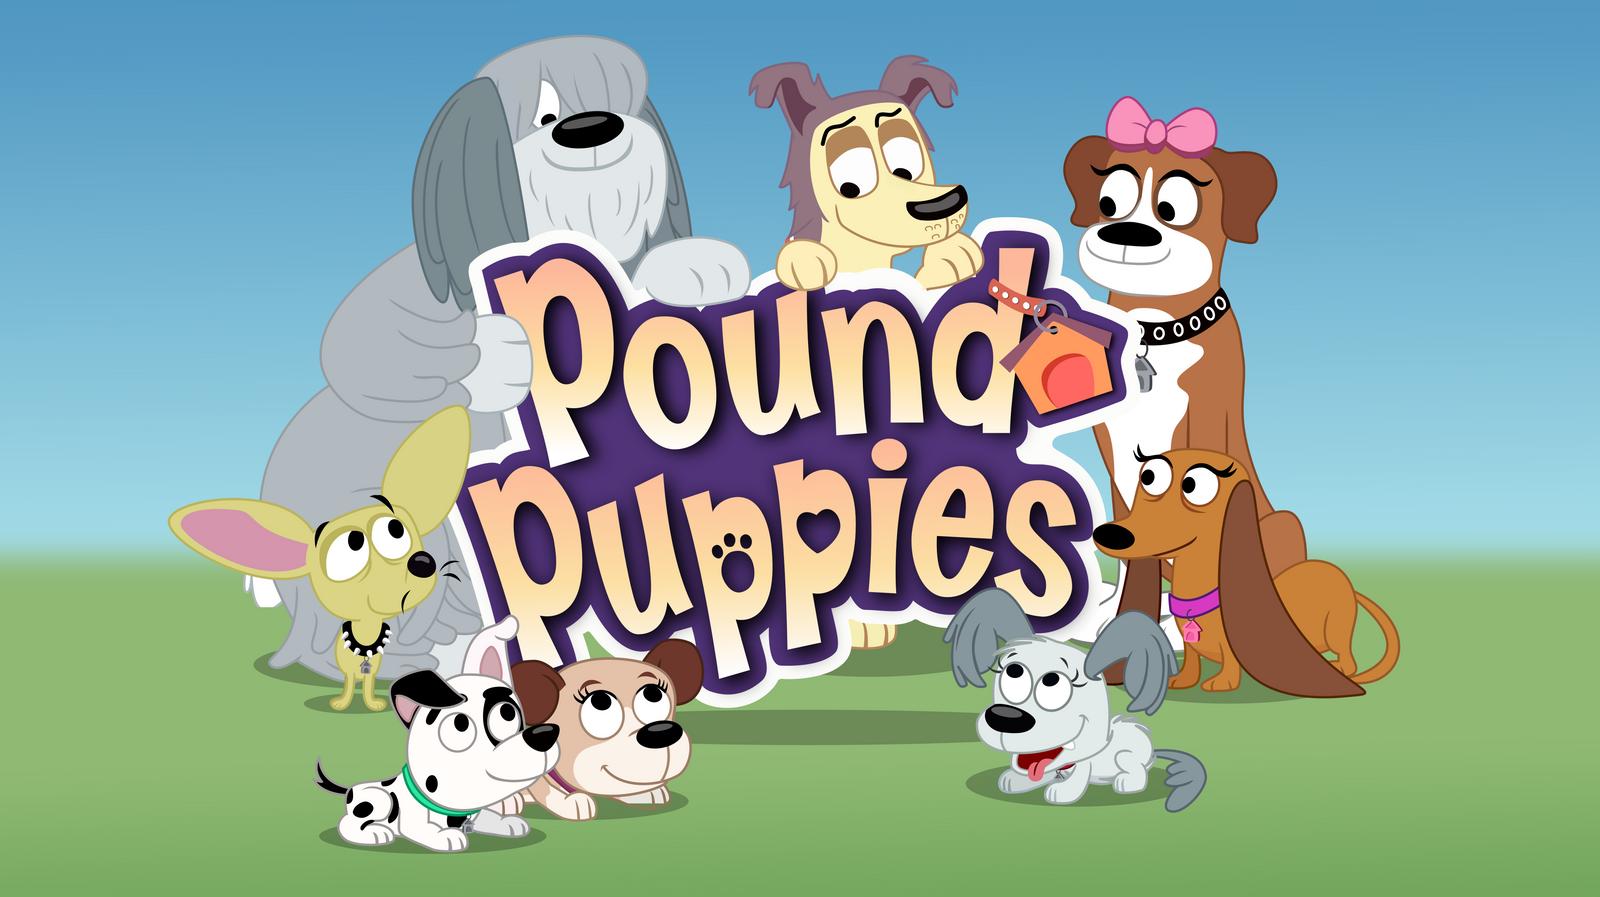 Pound Puppies Generations by toonaddict2001 on DeviantArt